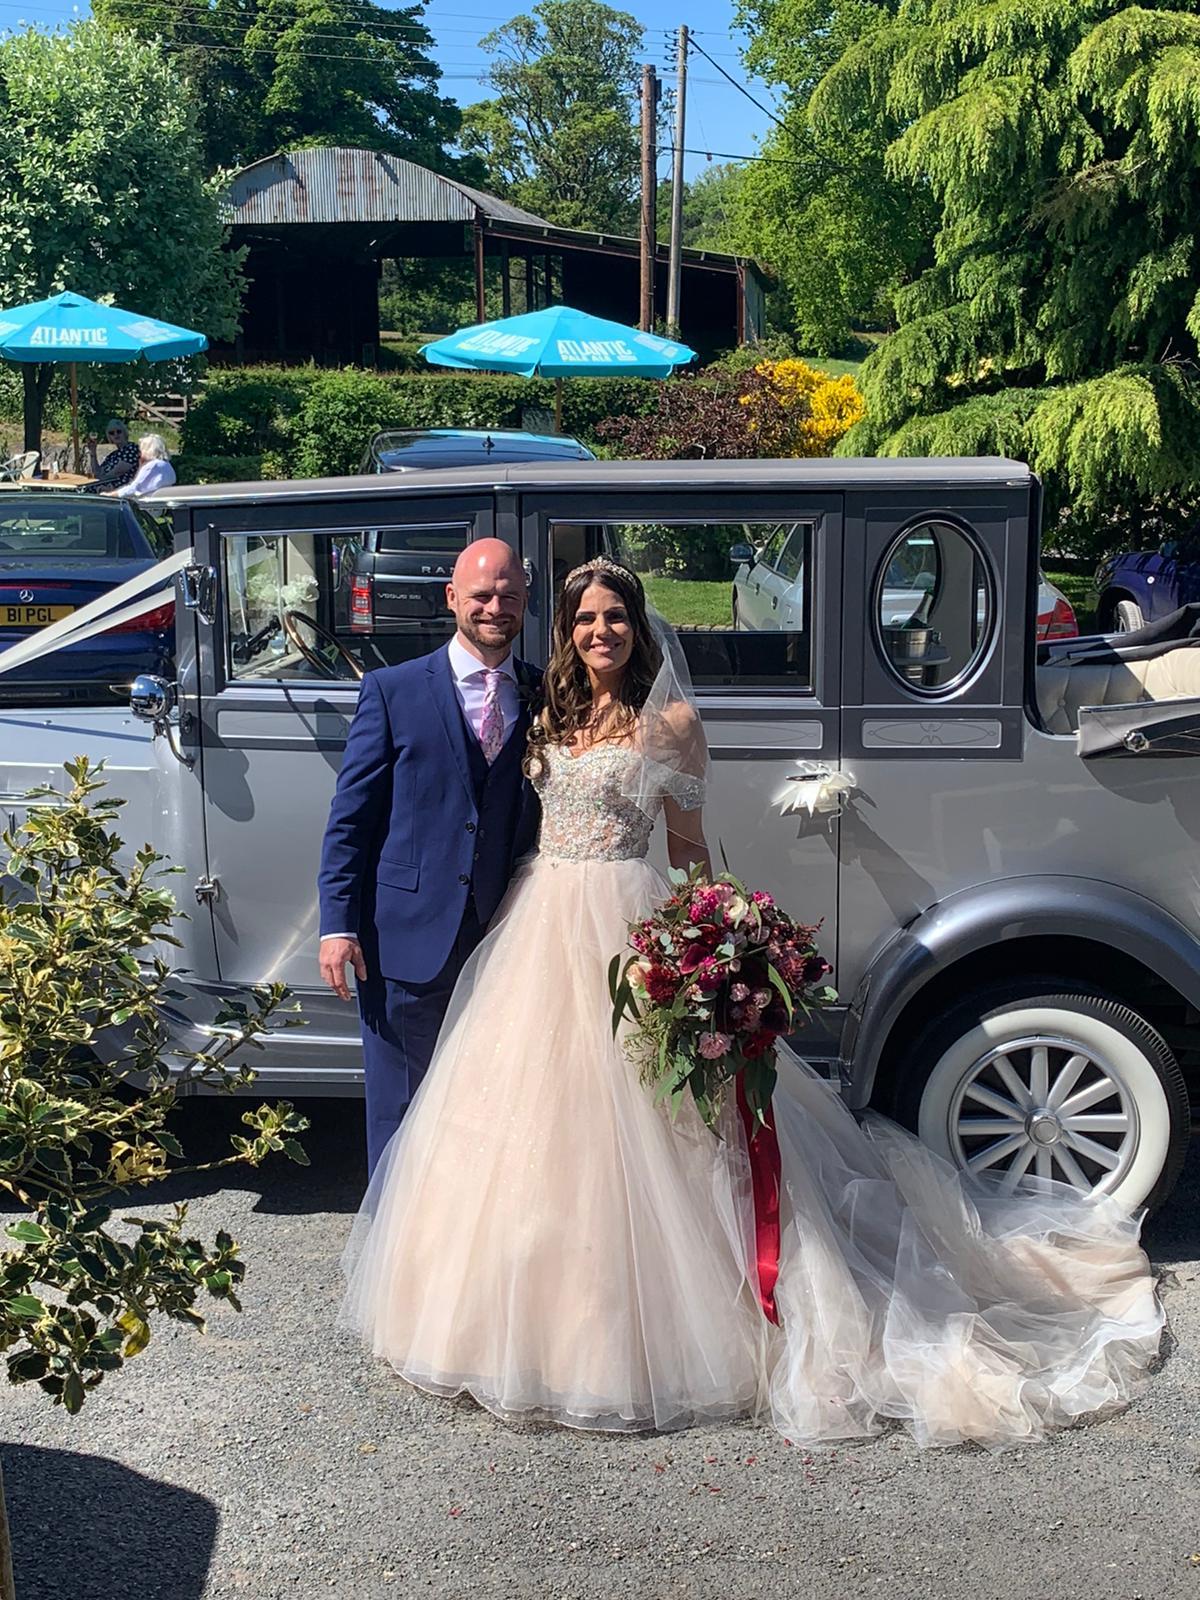 Bride Rachael Taylor with her groom Dan